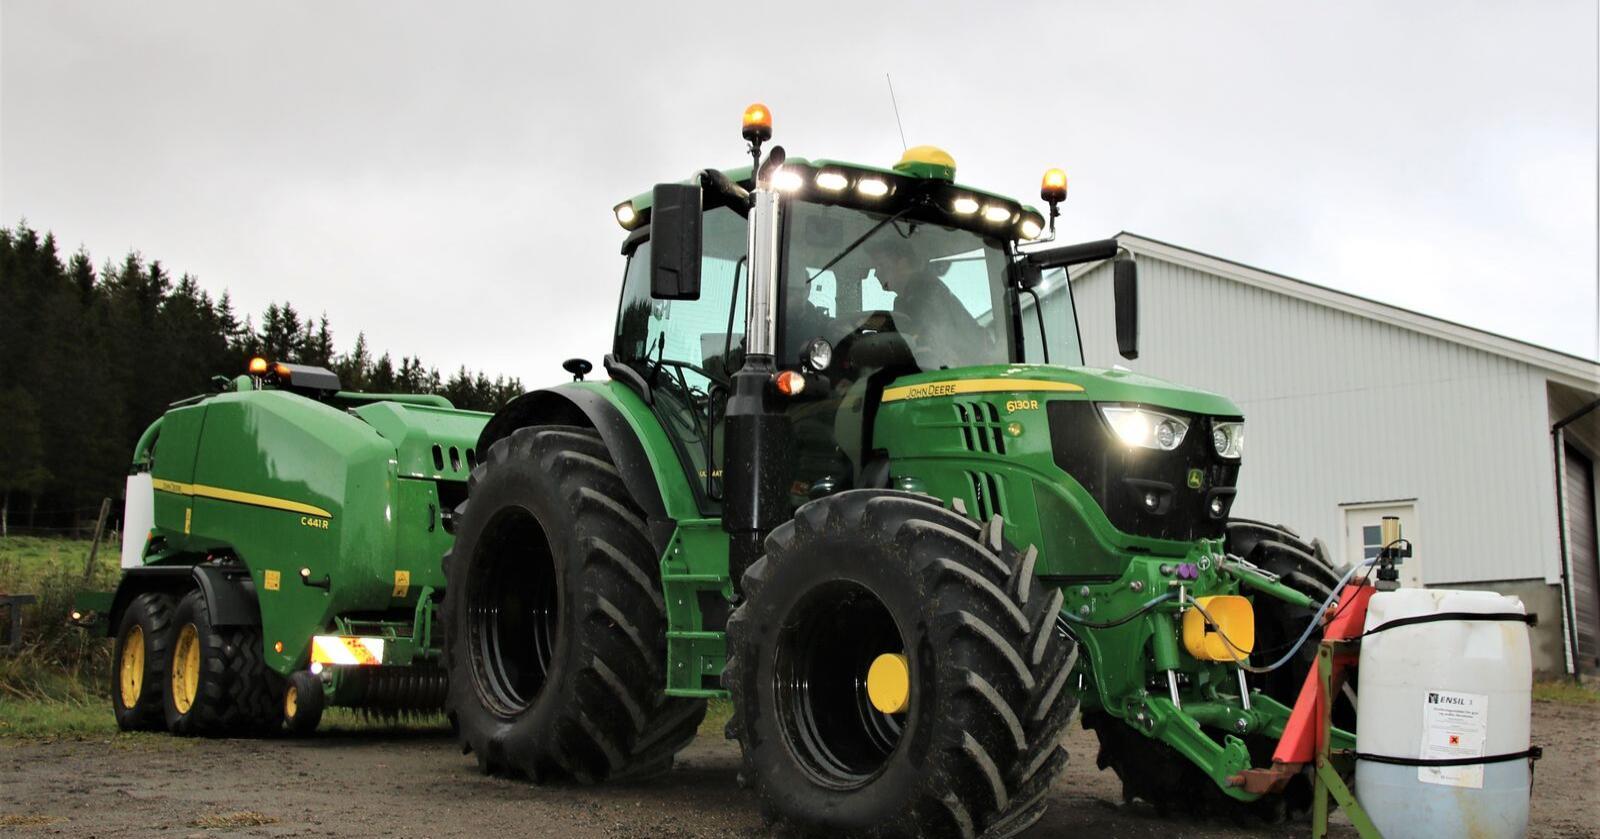 John Deere dro i land en knipen seier som Norges mest solgte traktor i 2019. Hakk i hel kom Valtra, med kun 11 færre registreringer. (Foto: Lars Raaen)